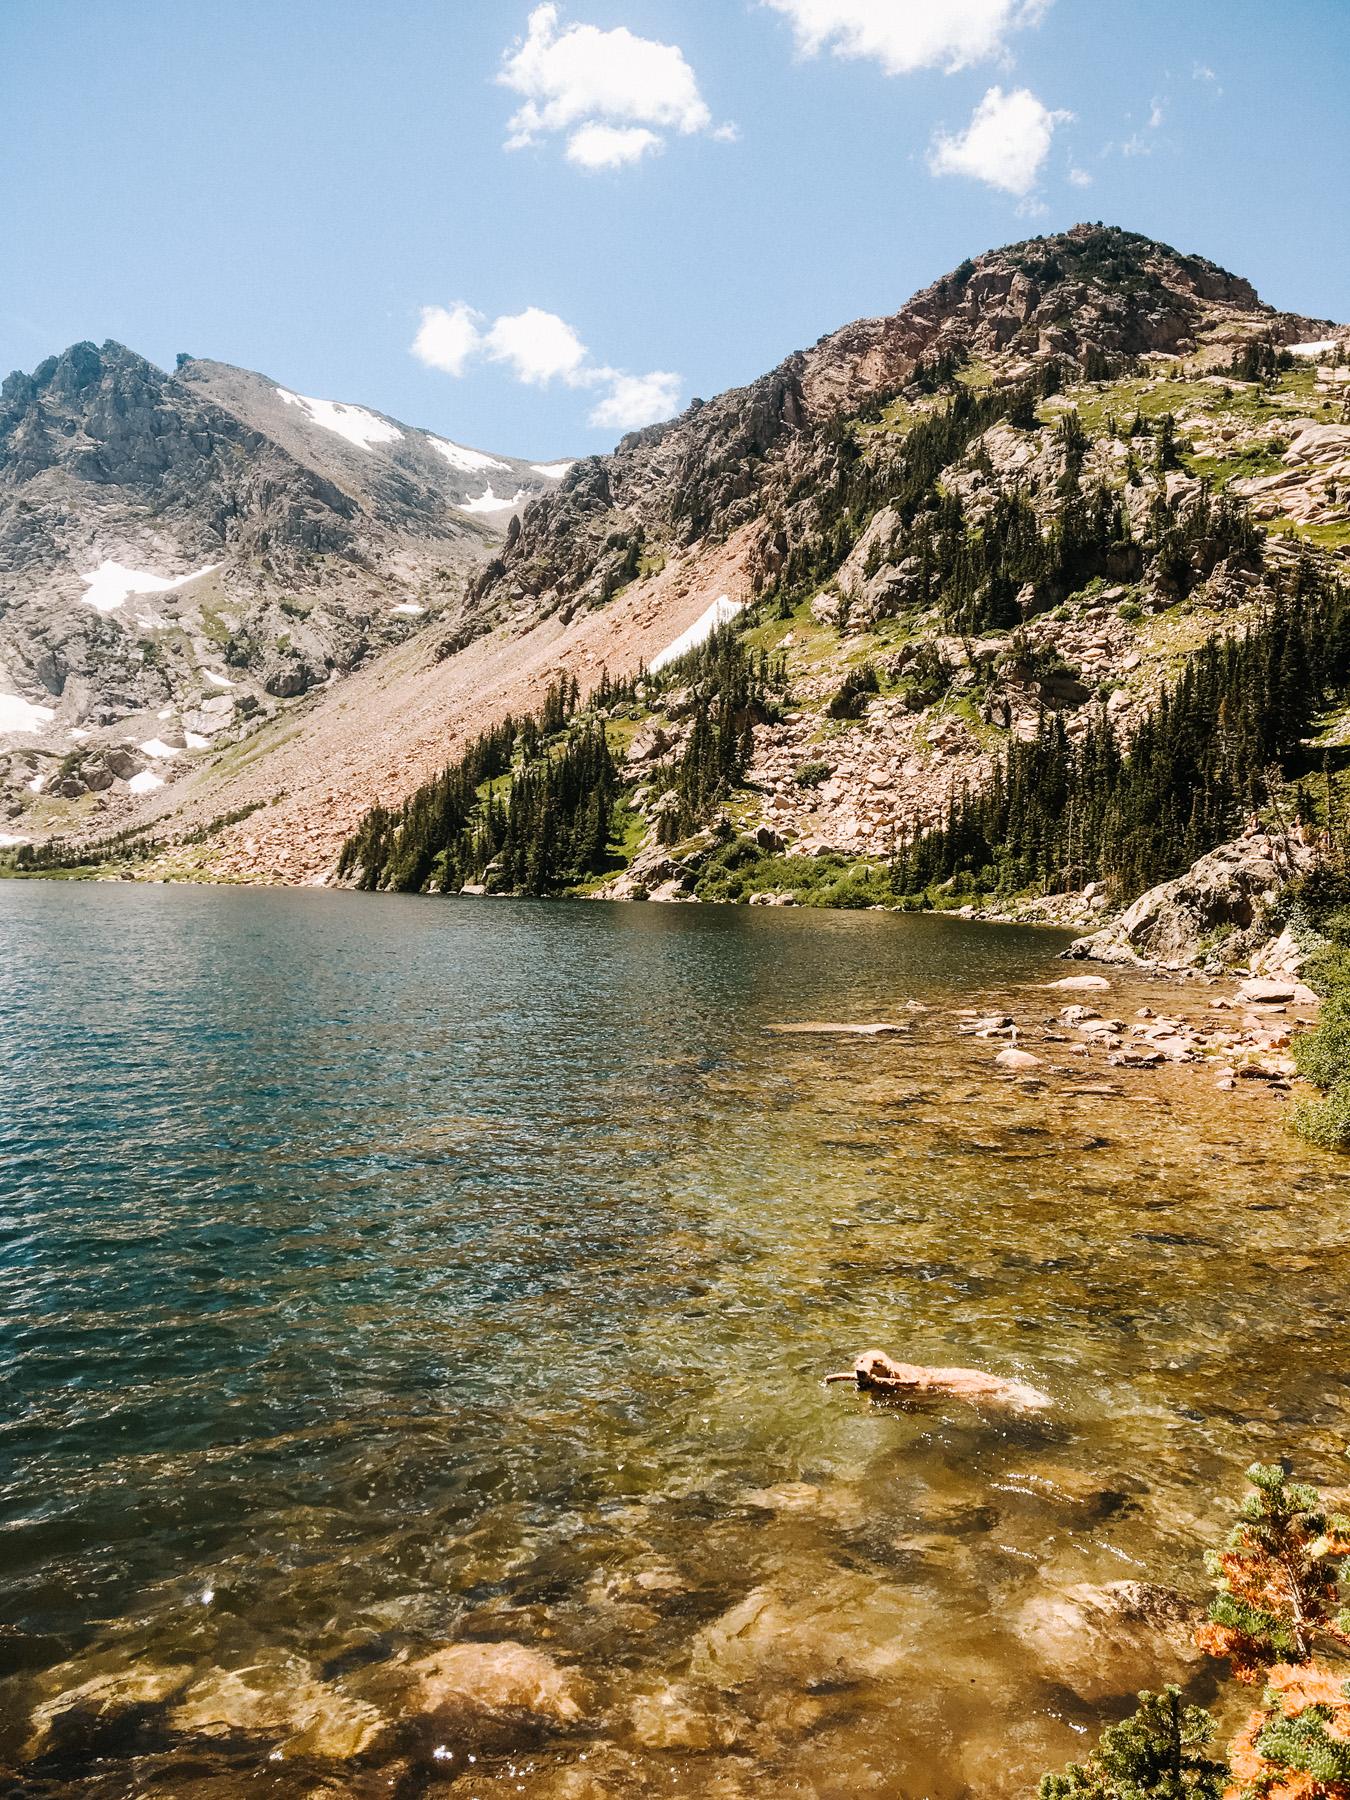 The 10 Best Hikes and Trails Near Denver | Lake Isabelle, Nederland